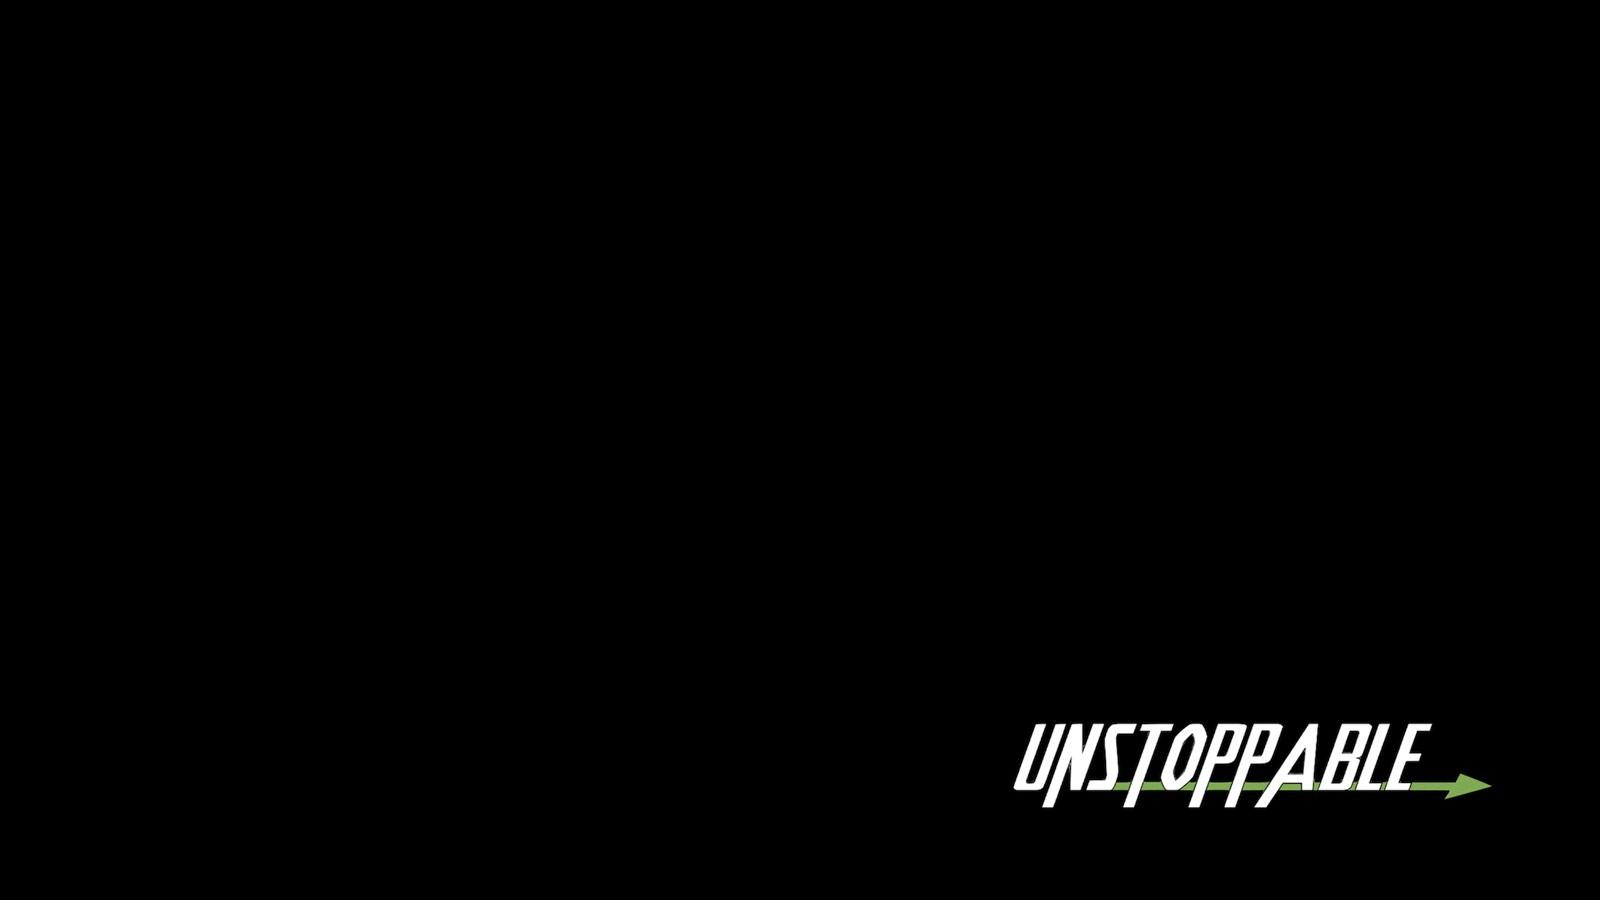 Unstoppable Impact Christian Church 1600x900